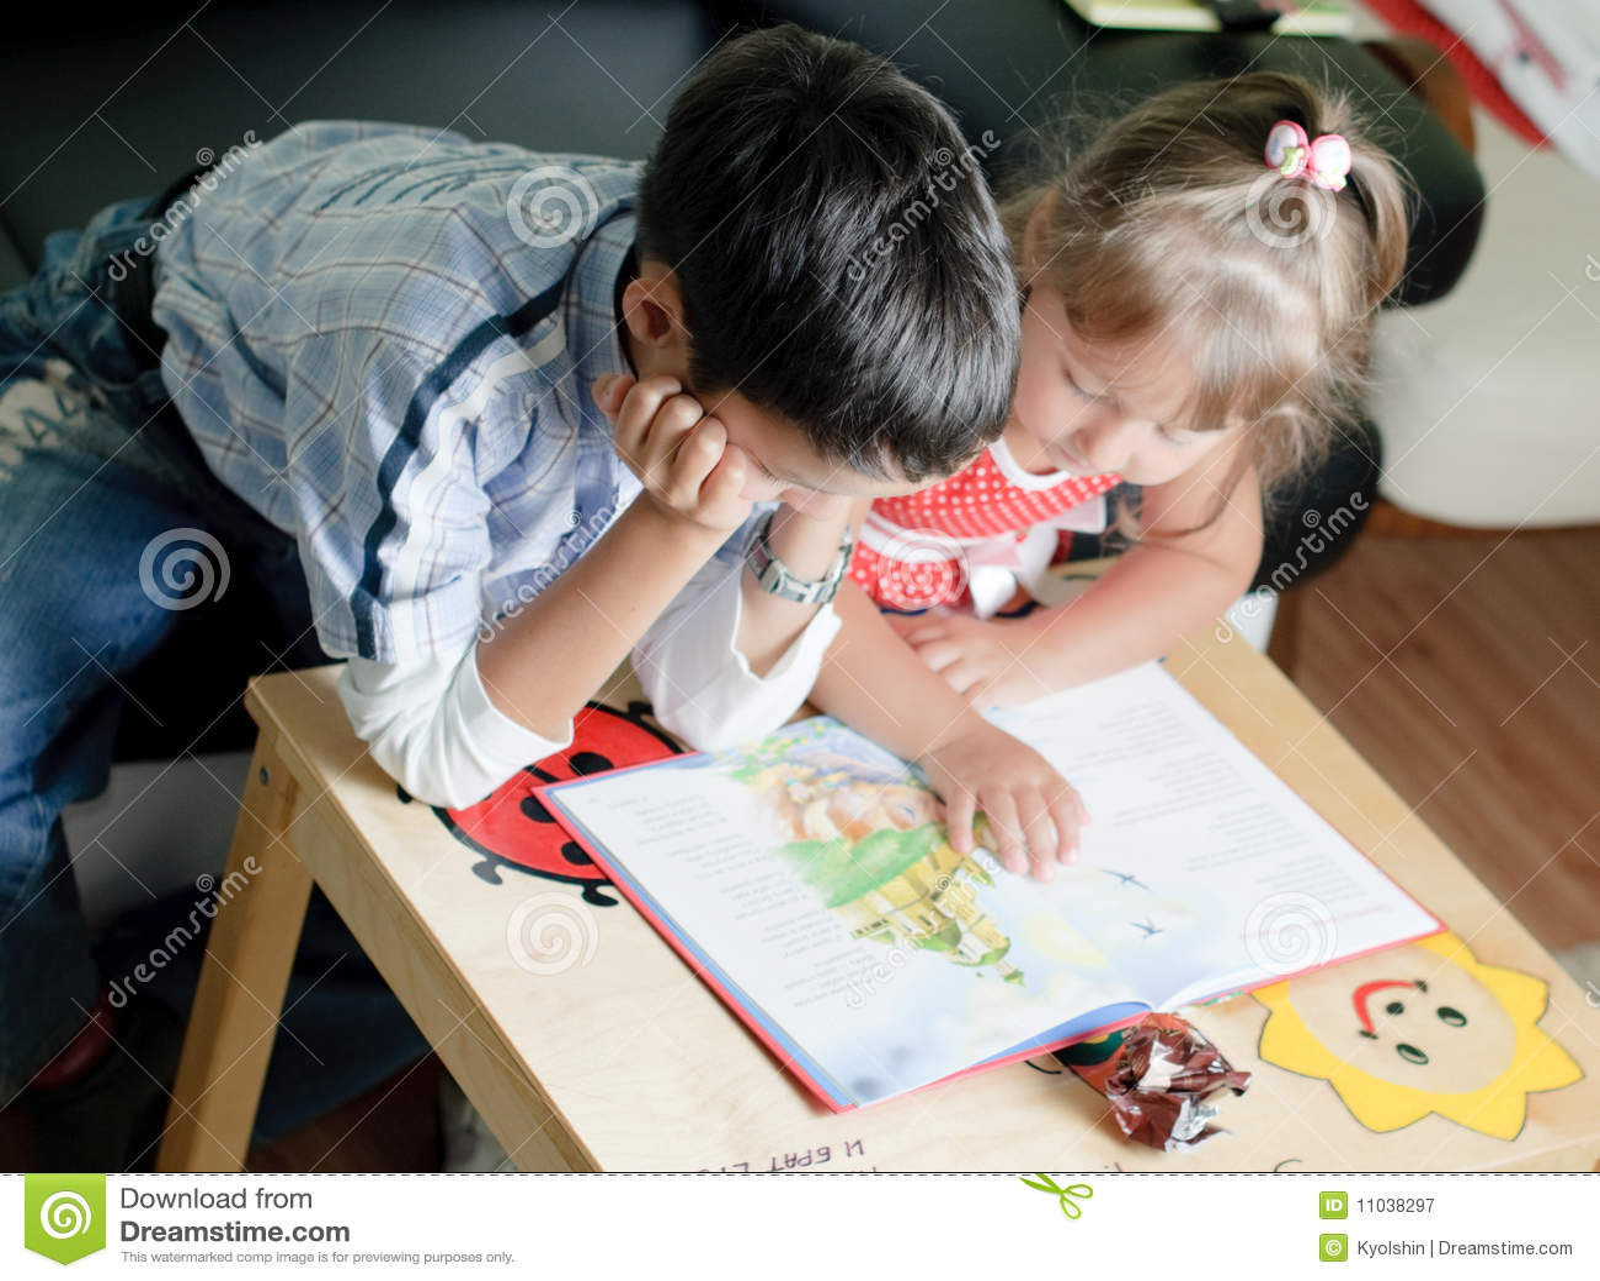 Сестра читала книгу а брат трахнул ее 21 фотография